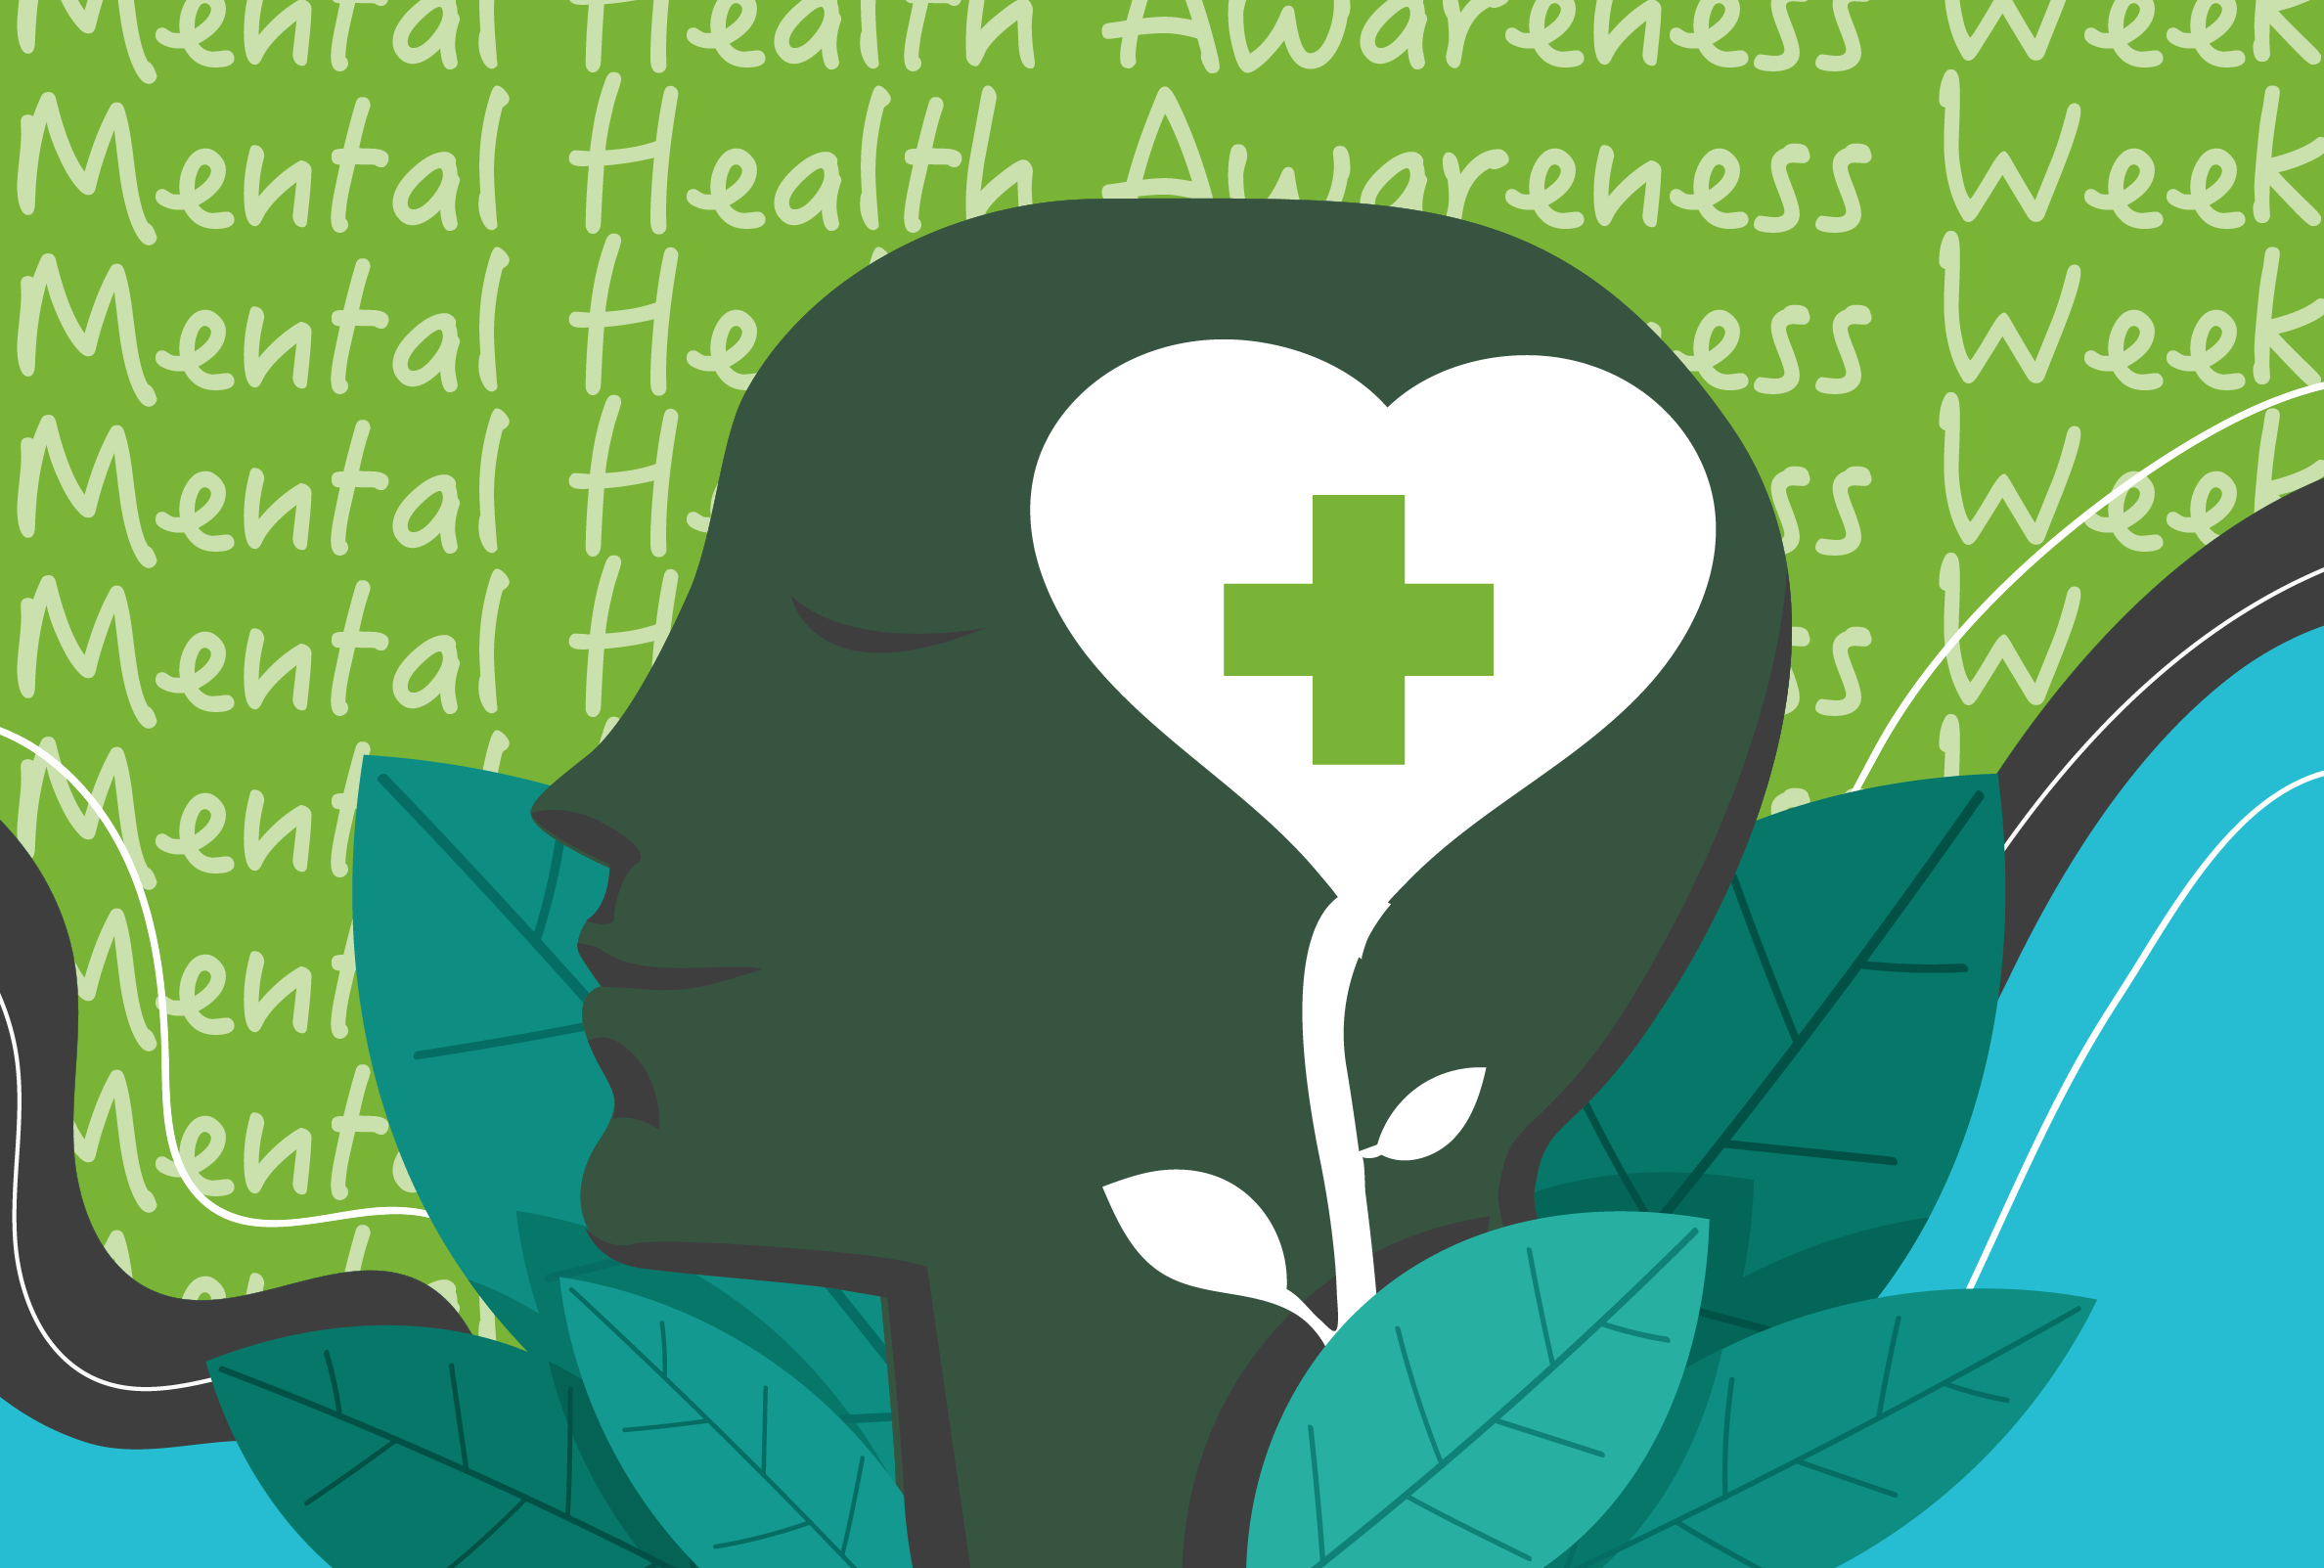 Vital Heating Solutions Mental Health Awareness Week 2021